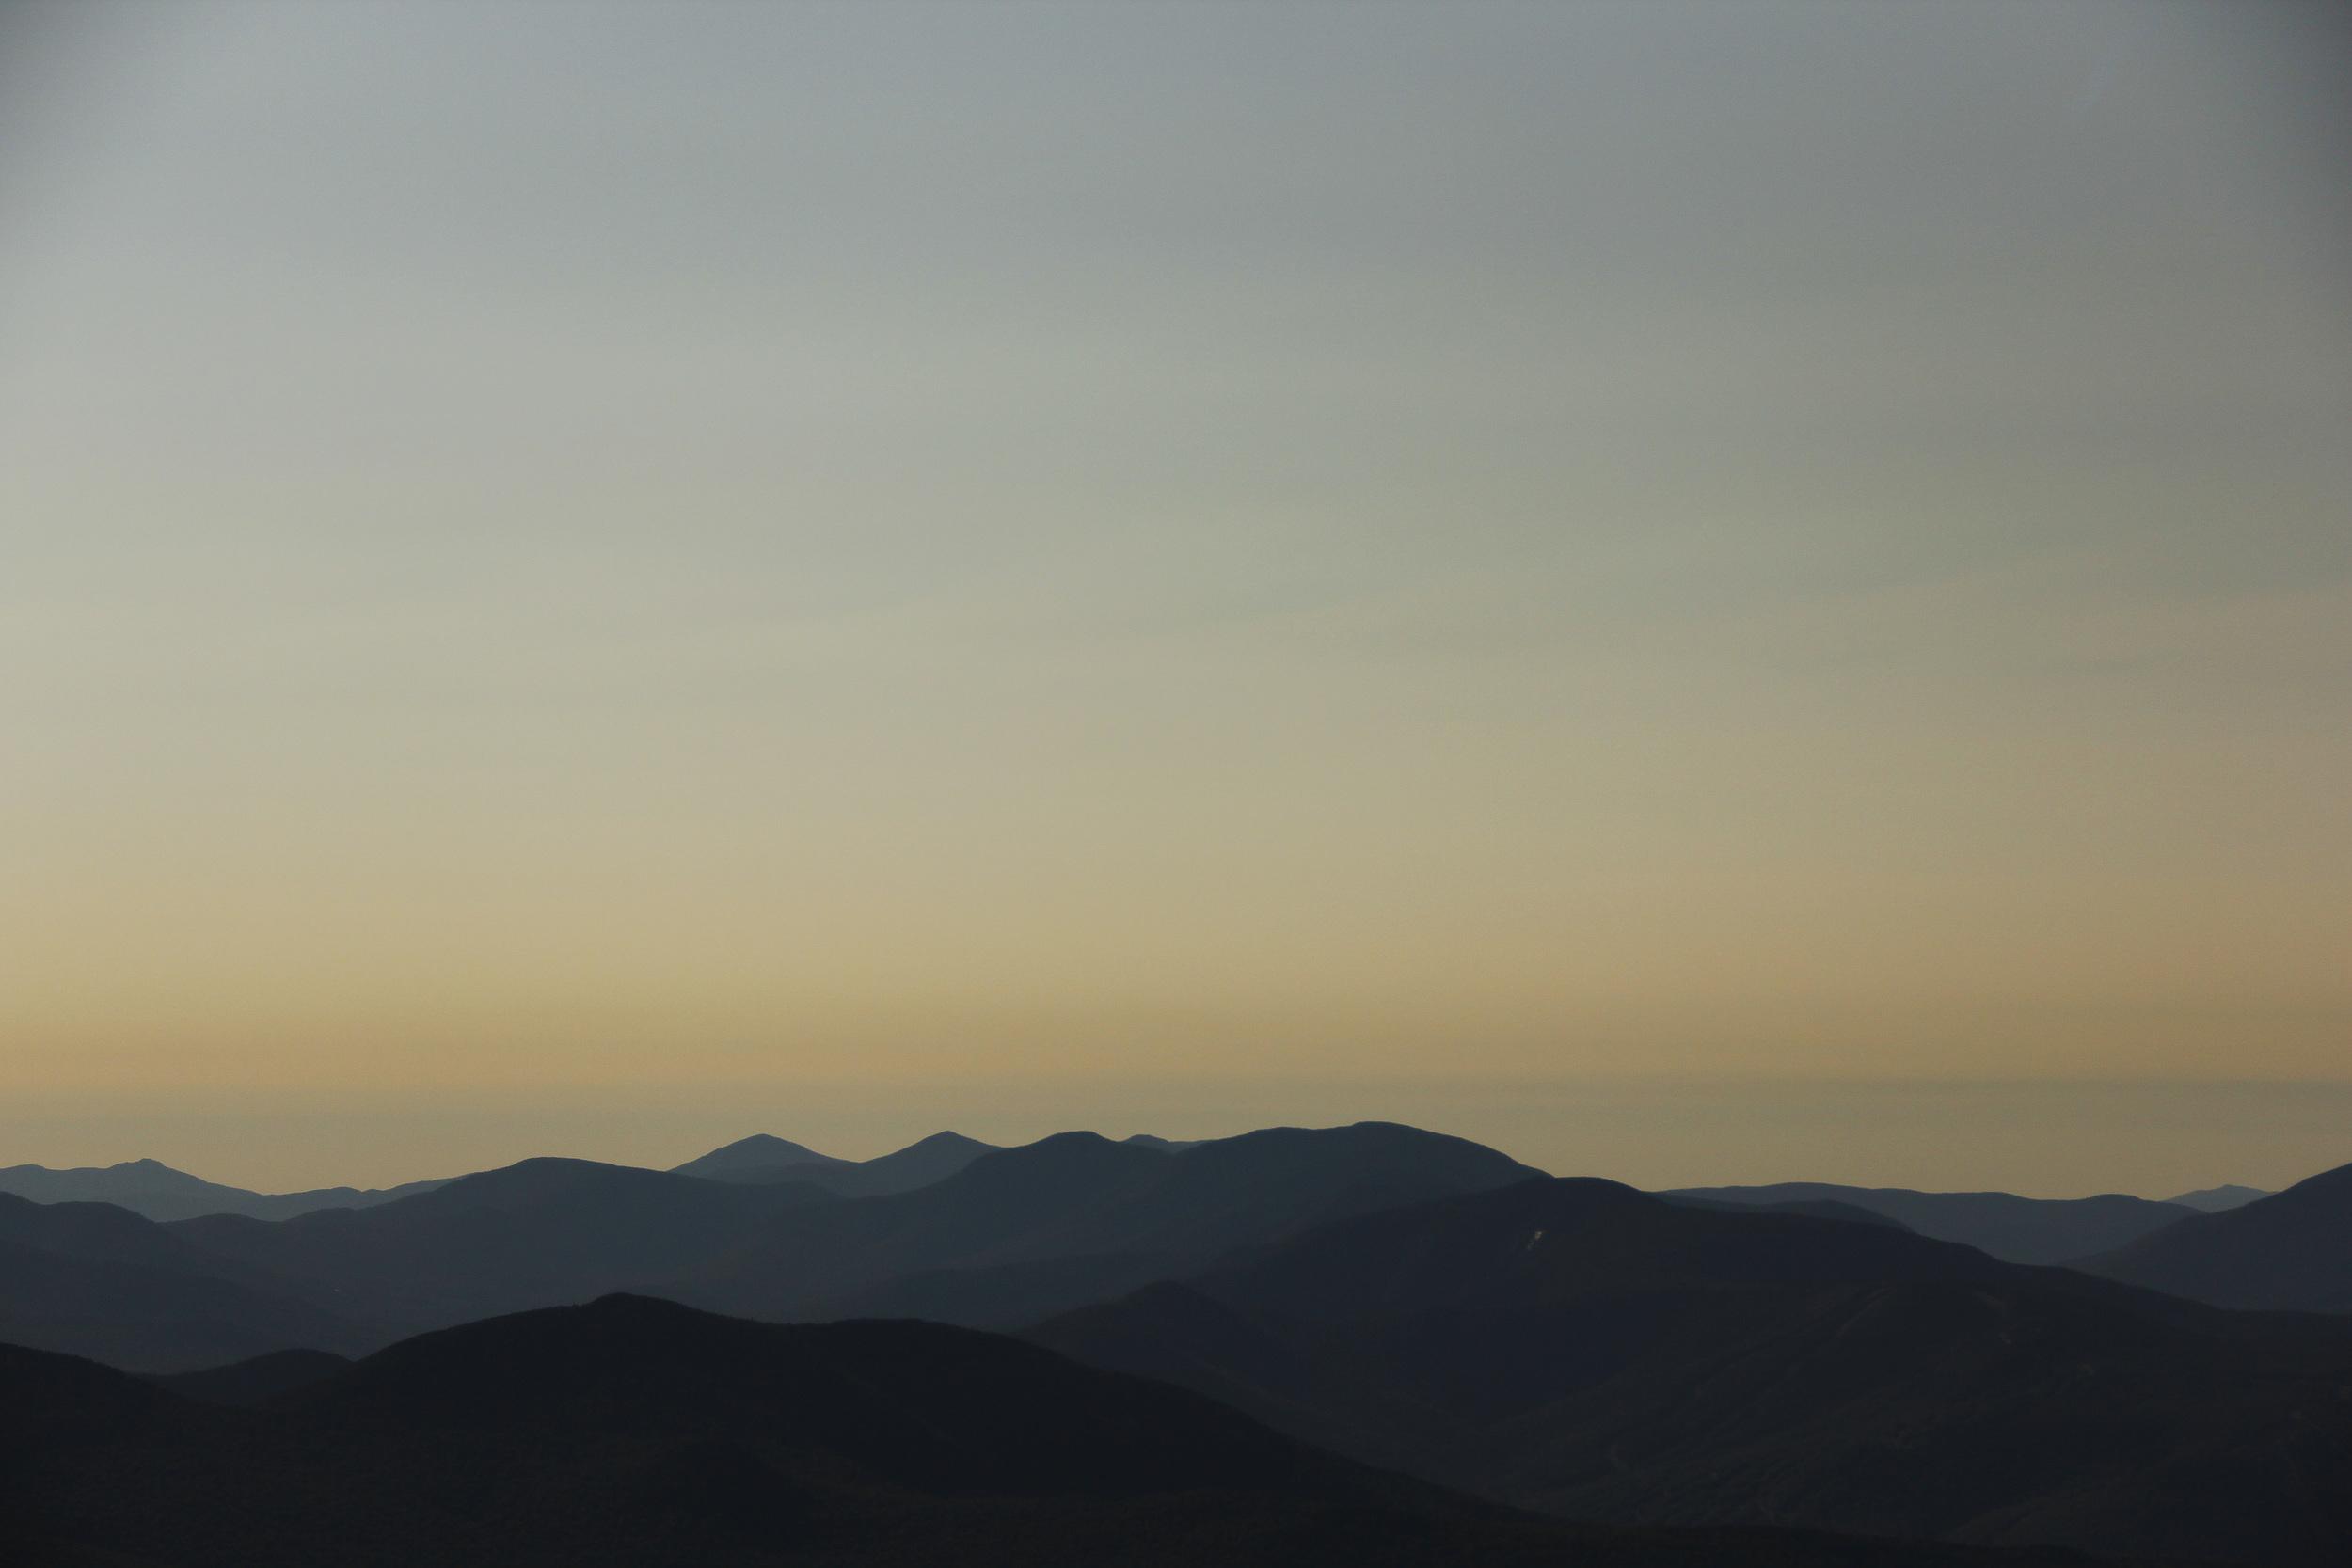 Plain old beautiful mountains.